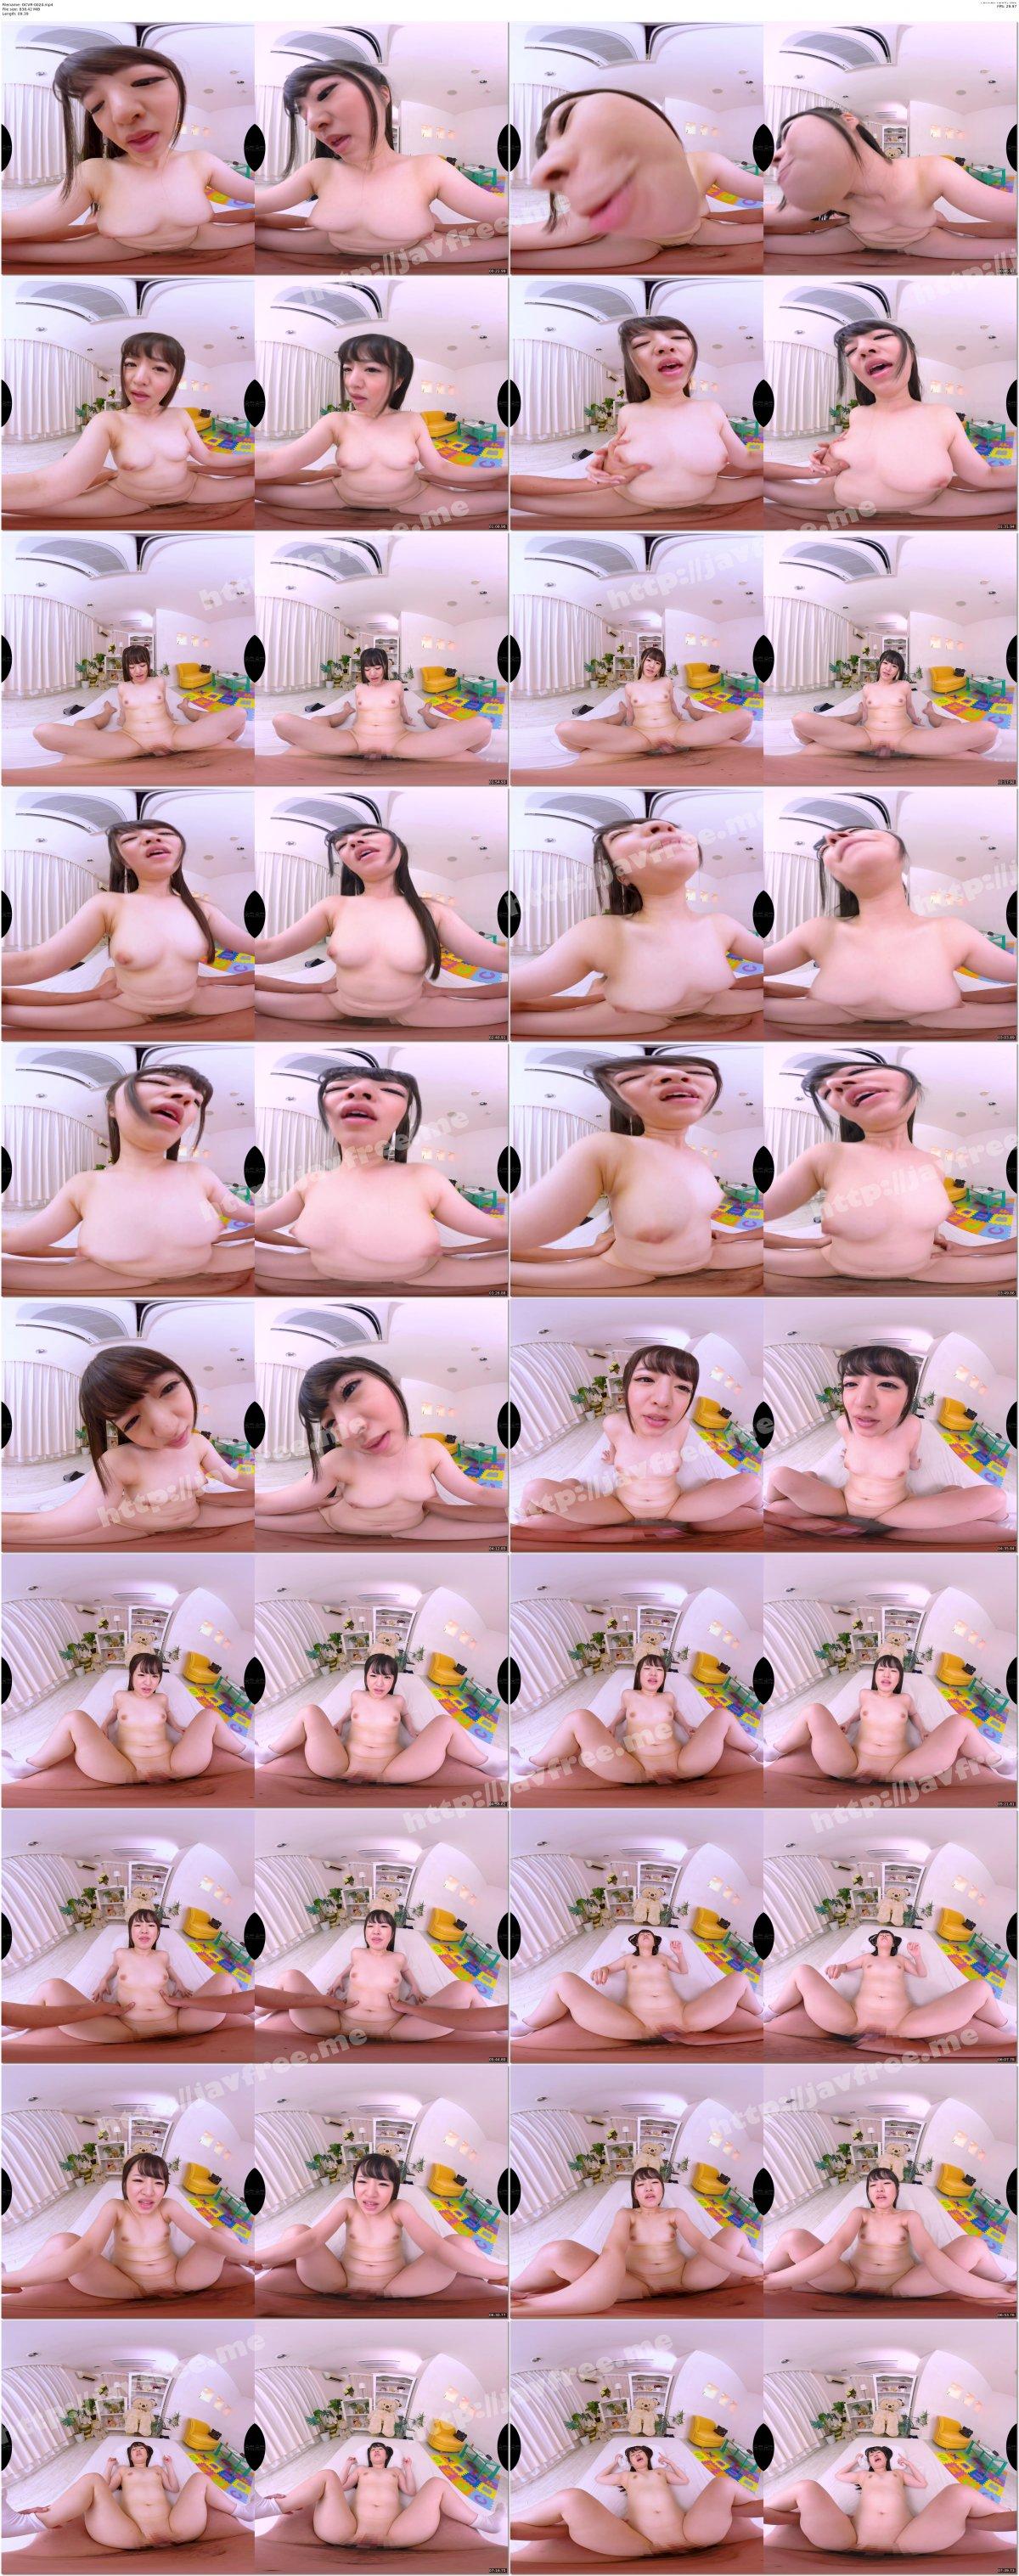 [OCVR-002] 【VR】3DVRからかい上手の可愛すぎる教え子に惚れ薬を飲ませたらアヘ顔全開イクイク!?大変なことになった件。桃尻かのん - image OCVR-002d on https://javfree.me